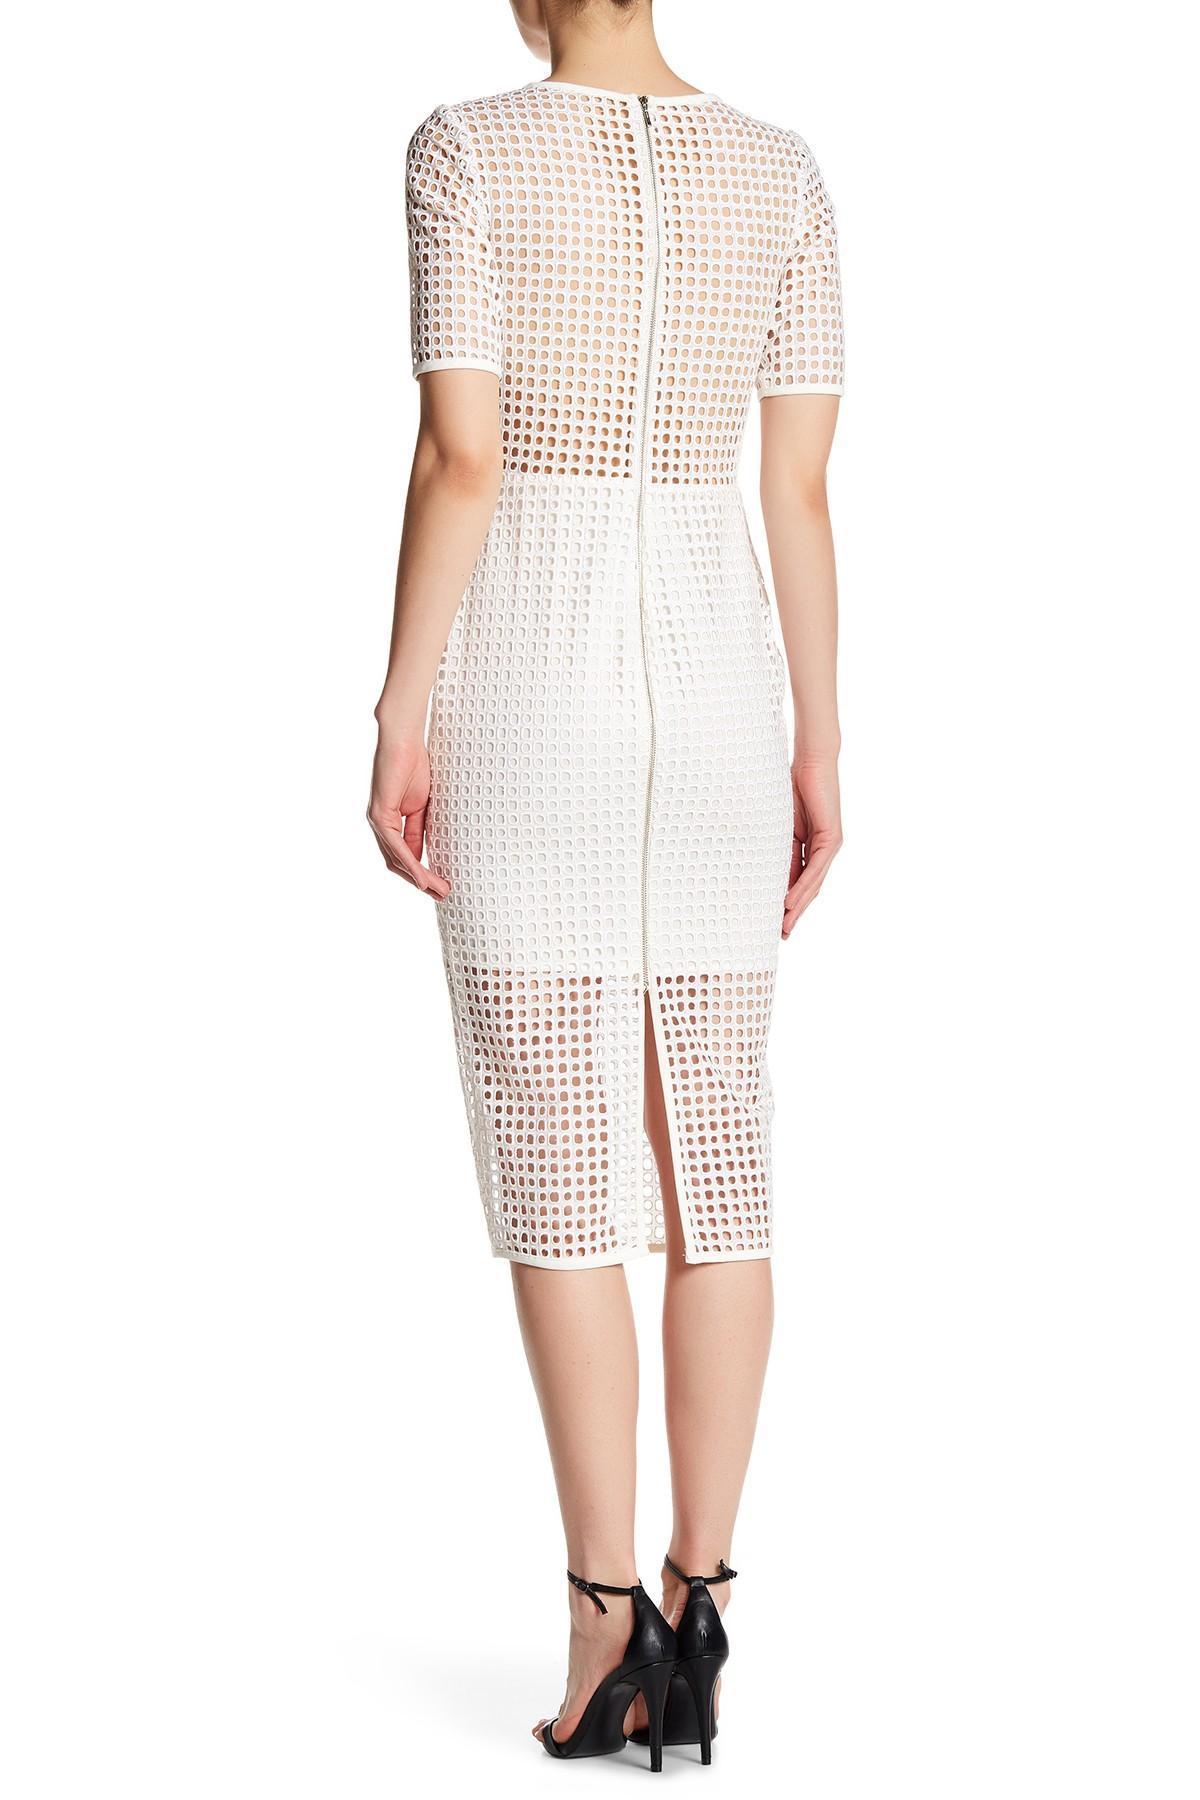 Lyst Nicole Bakti Short Sleeve Eyelet Dress In White